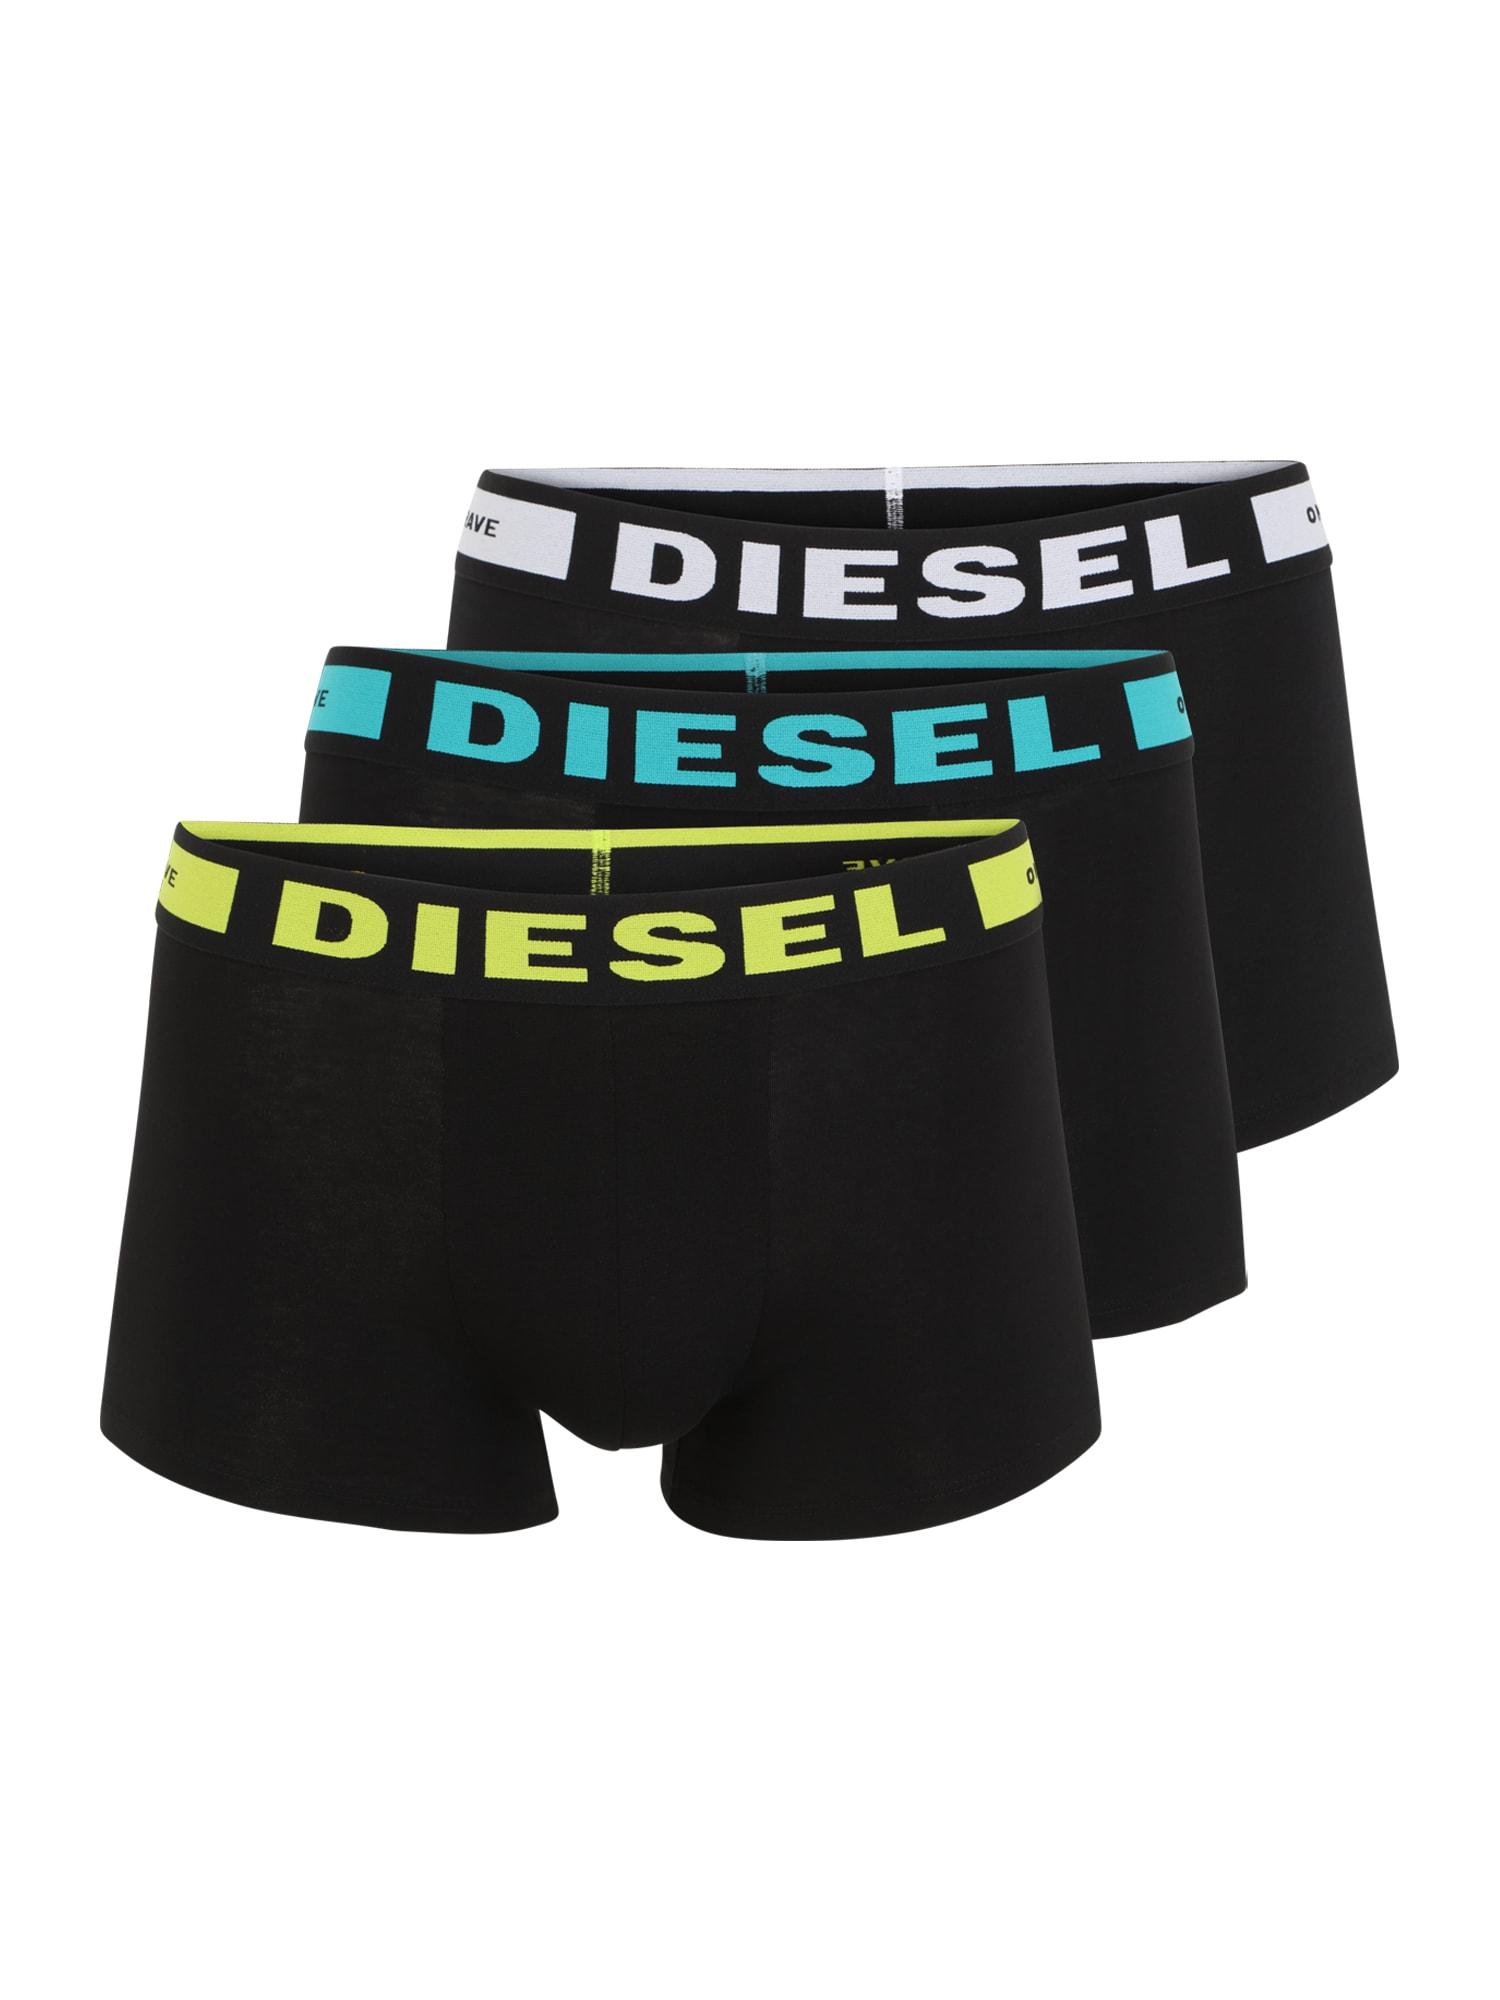 DIESEL Boxer trumpikės juoda / geltona / balta / turkio spalva